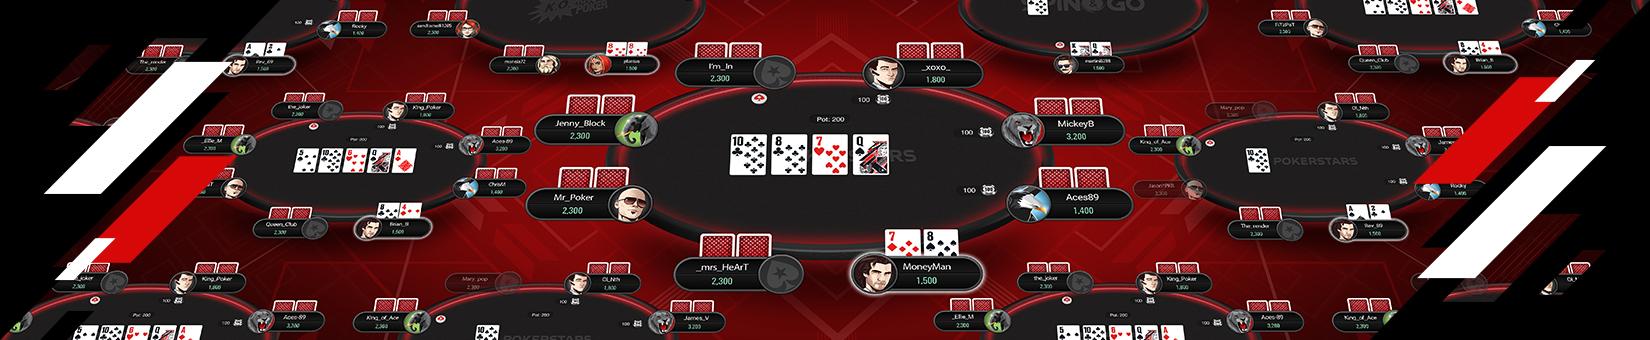 Poker Tournament Types Pokerstars Structured Tournaments